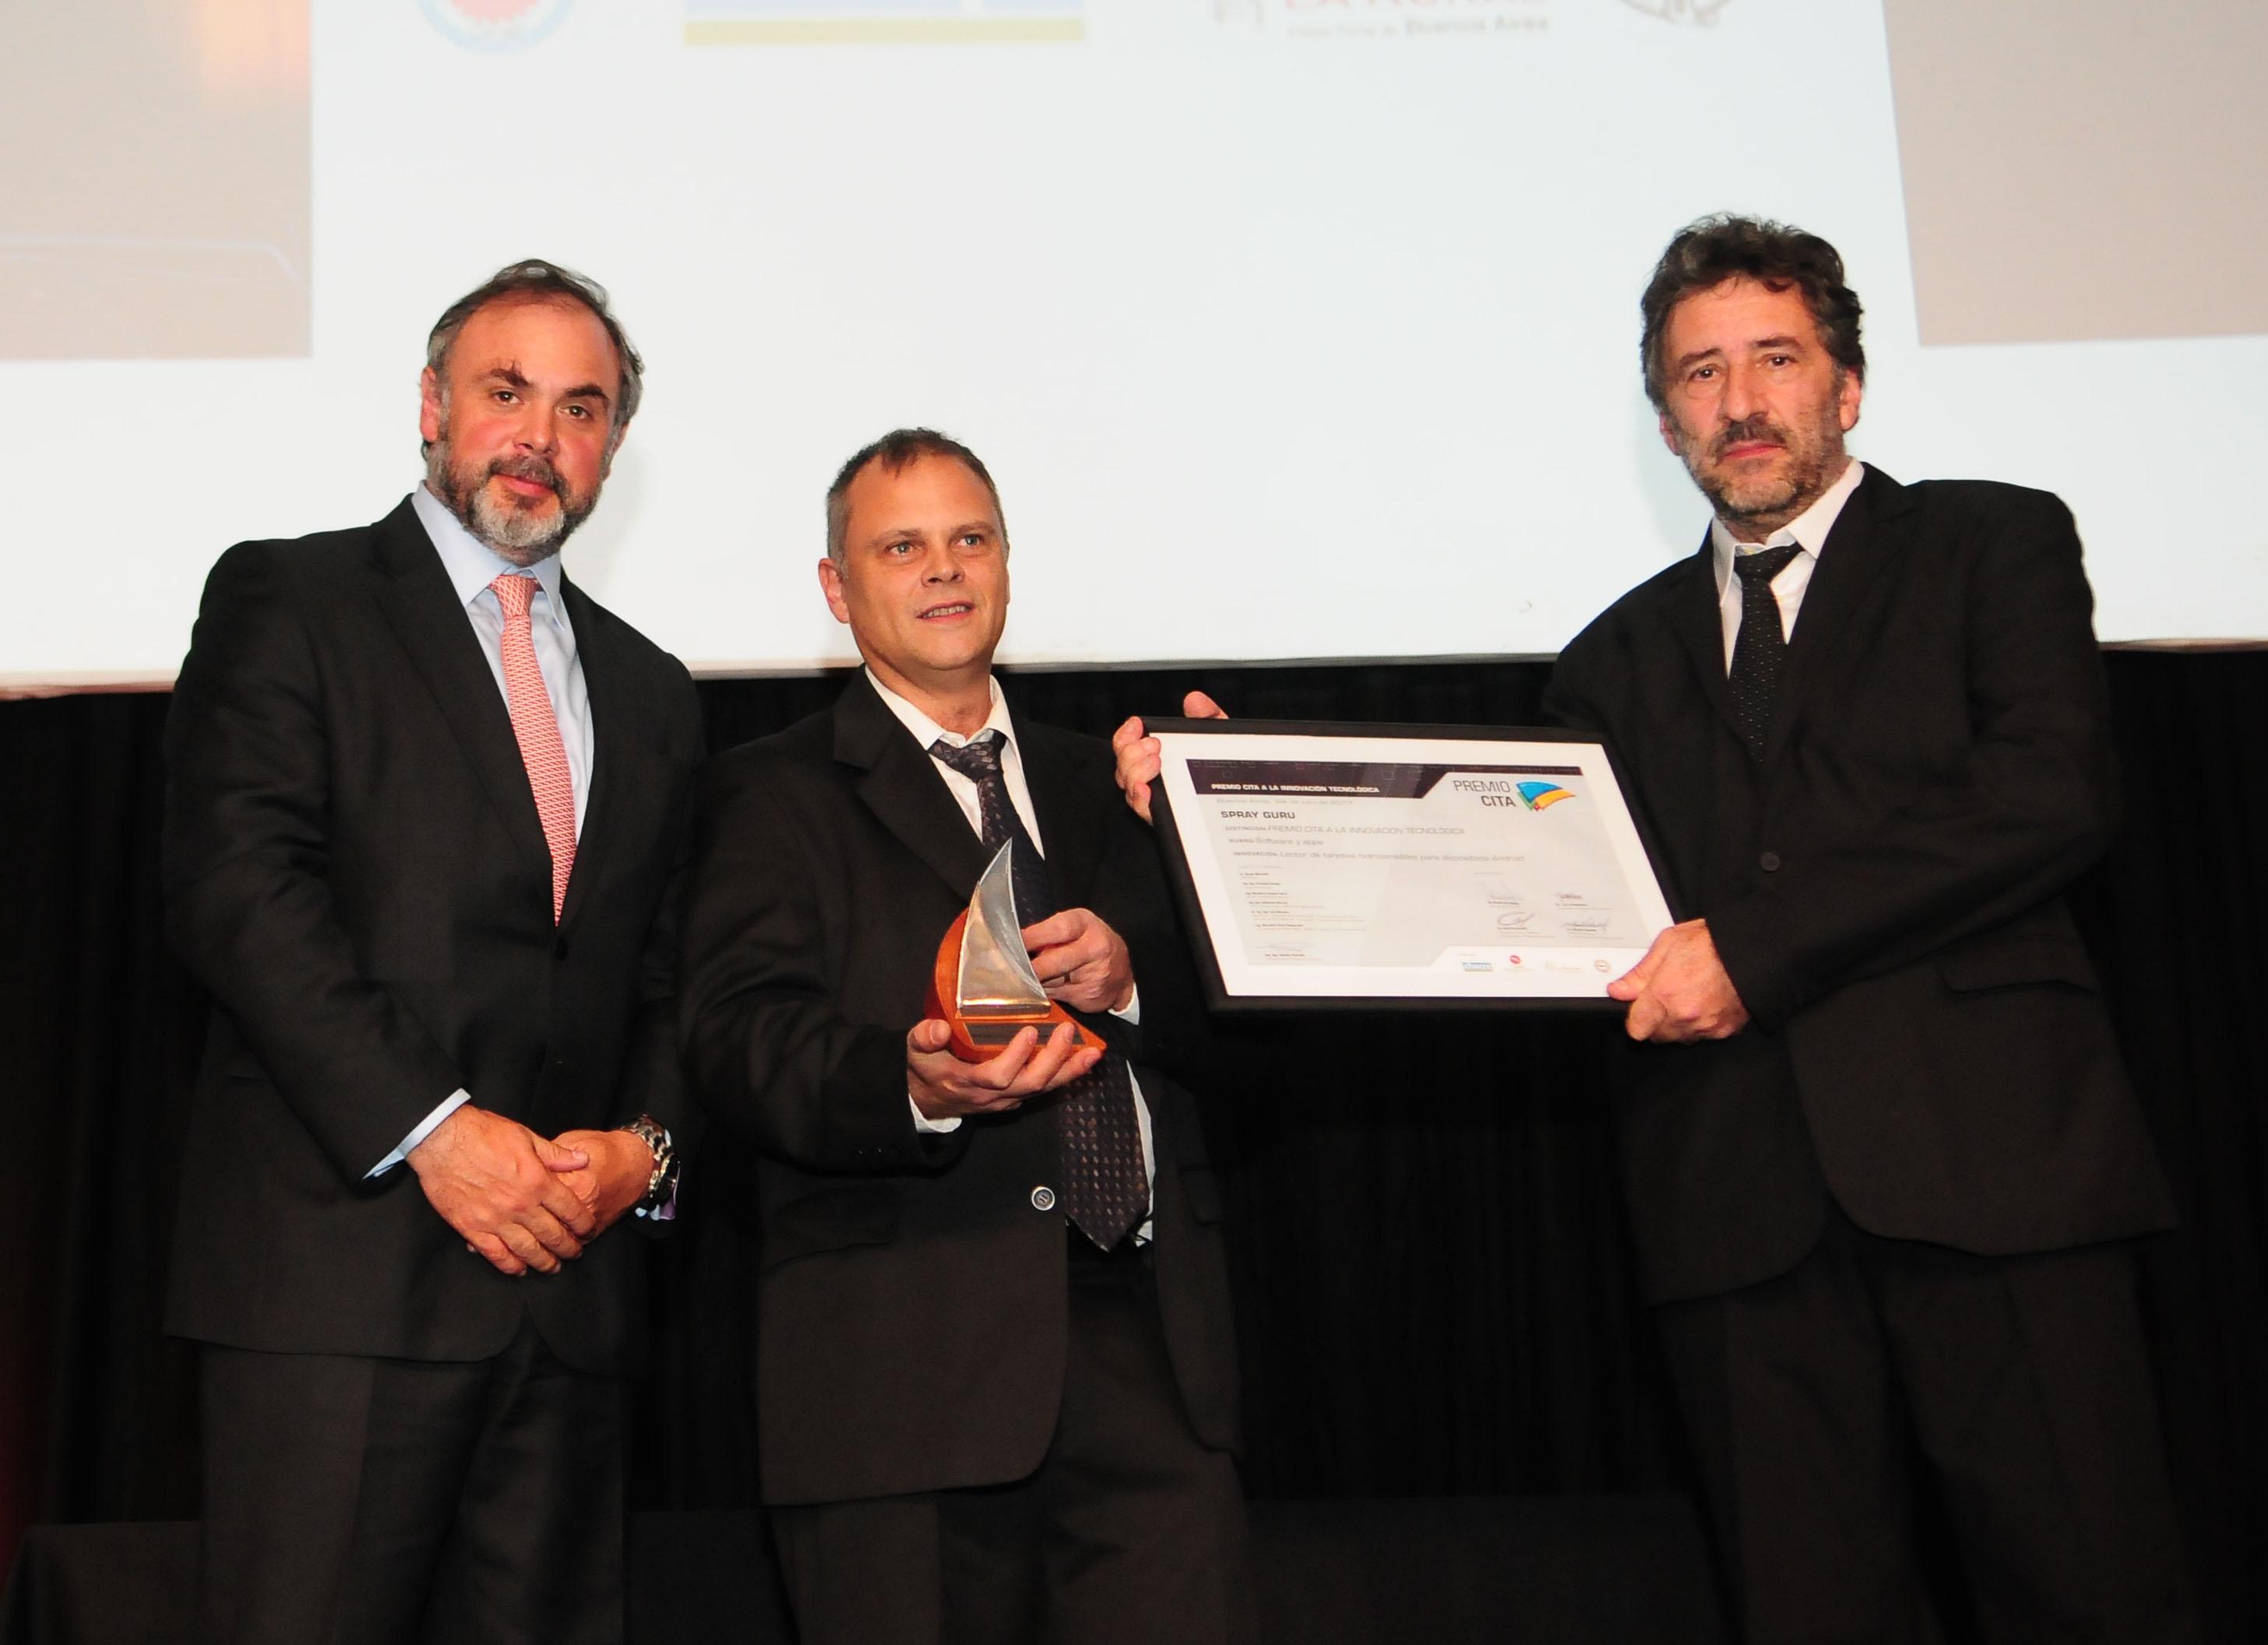 SprayGuru ganó el Premio CiTA